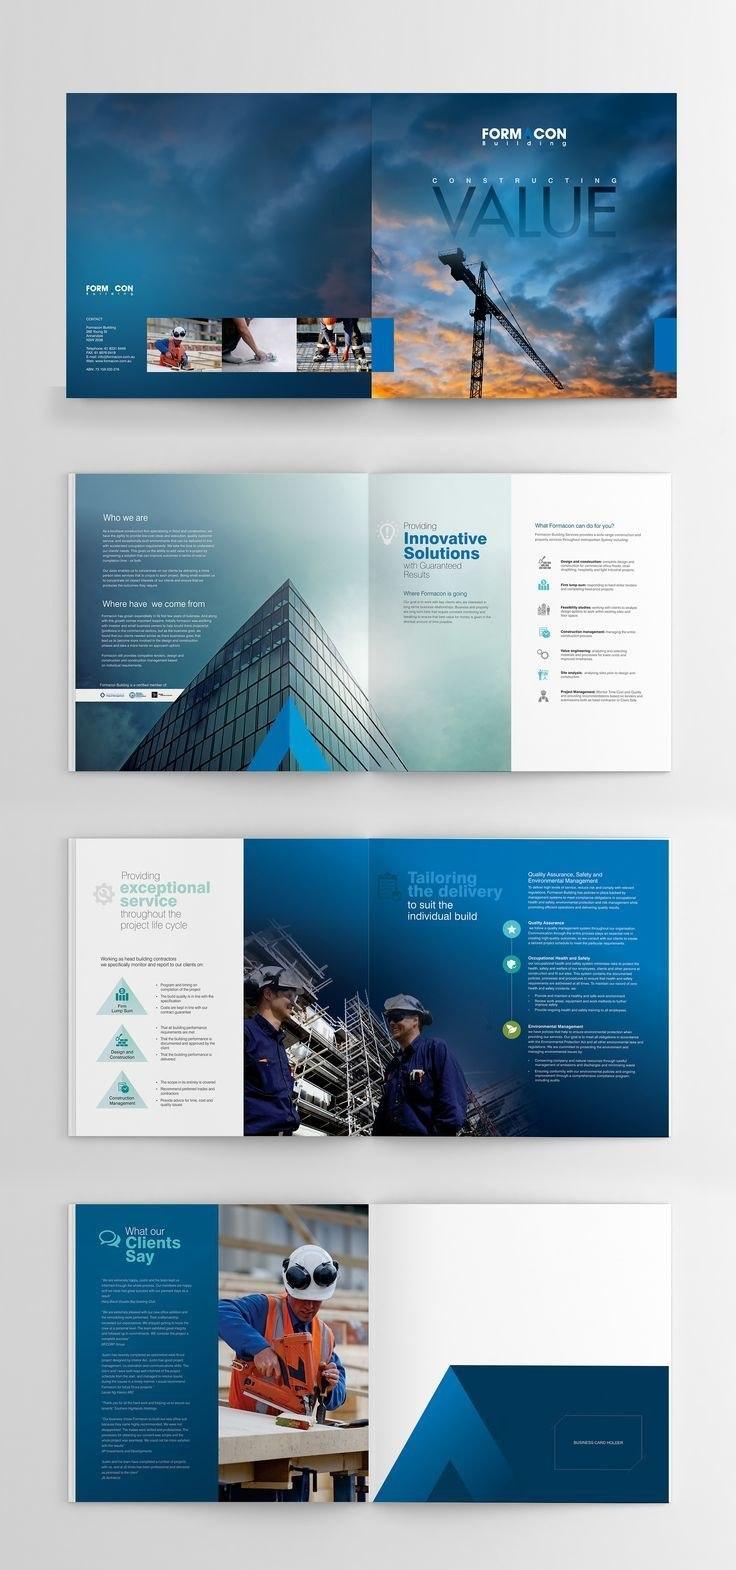 Free Brochure Templates Design  Print Brochures Online Intended For Online Free Brochure Design Templates